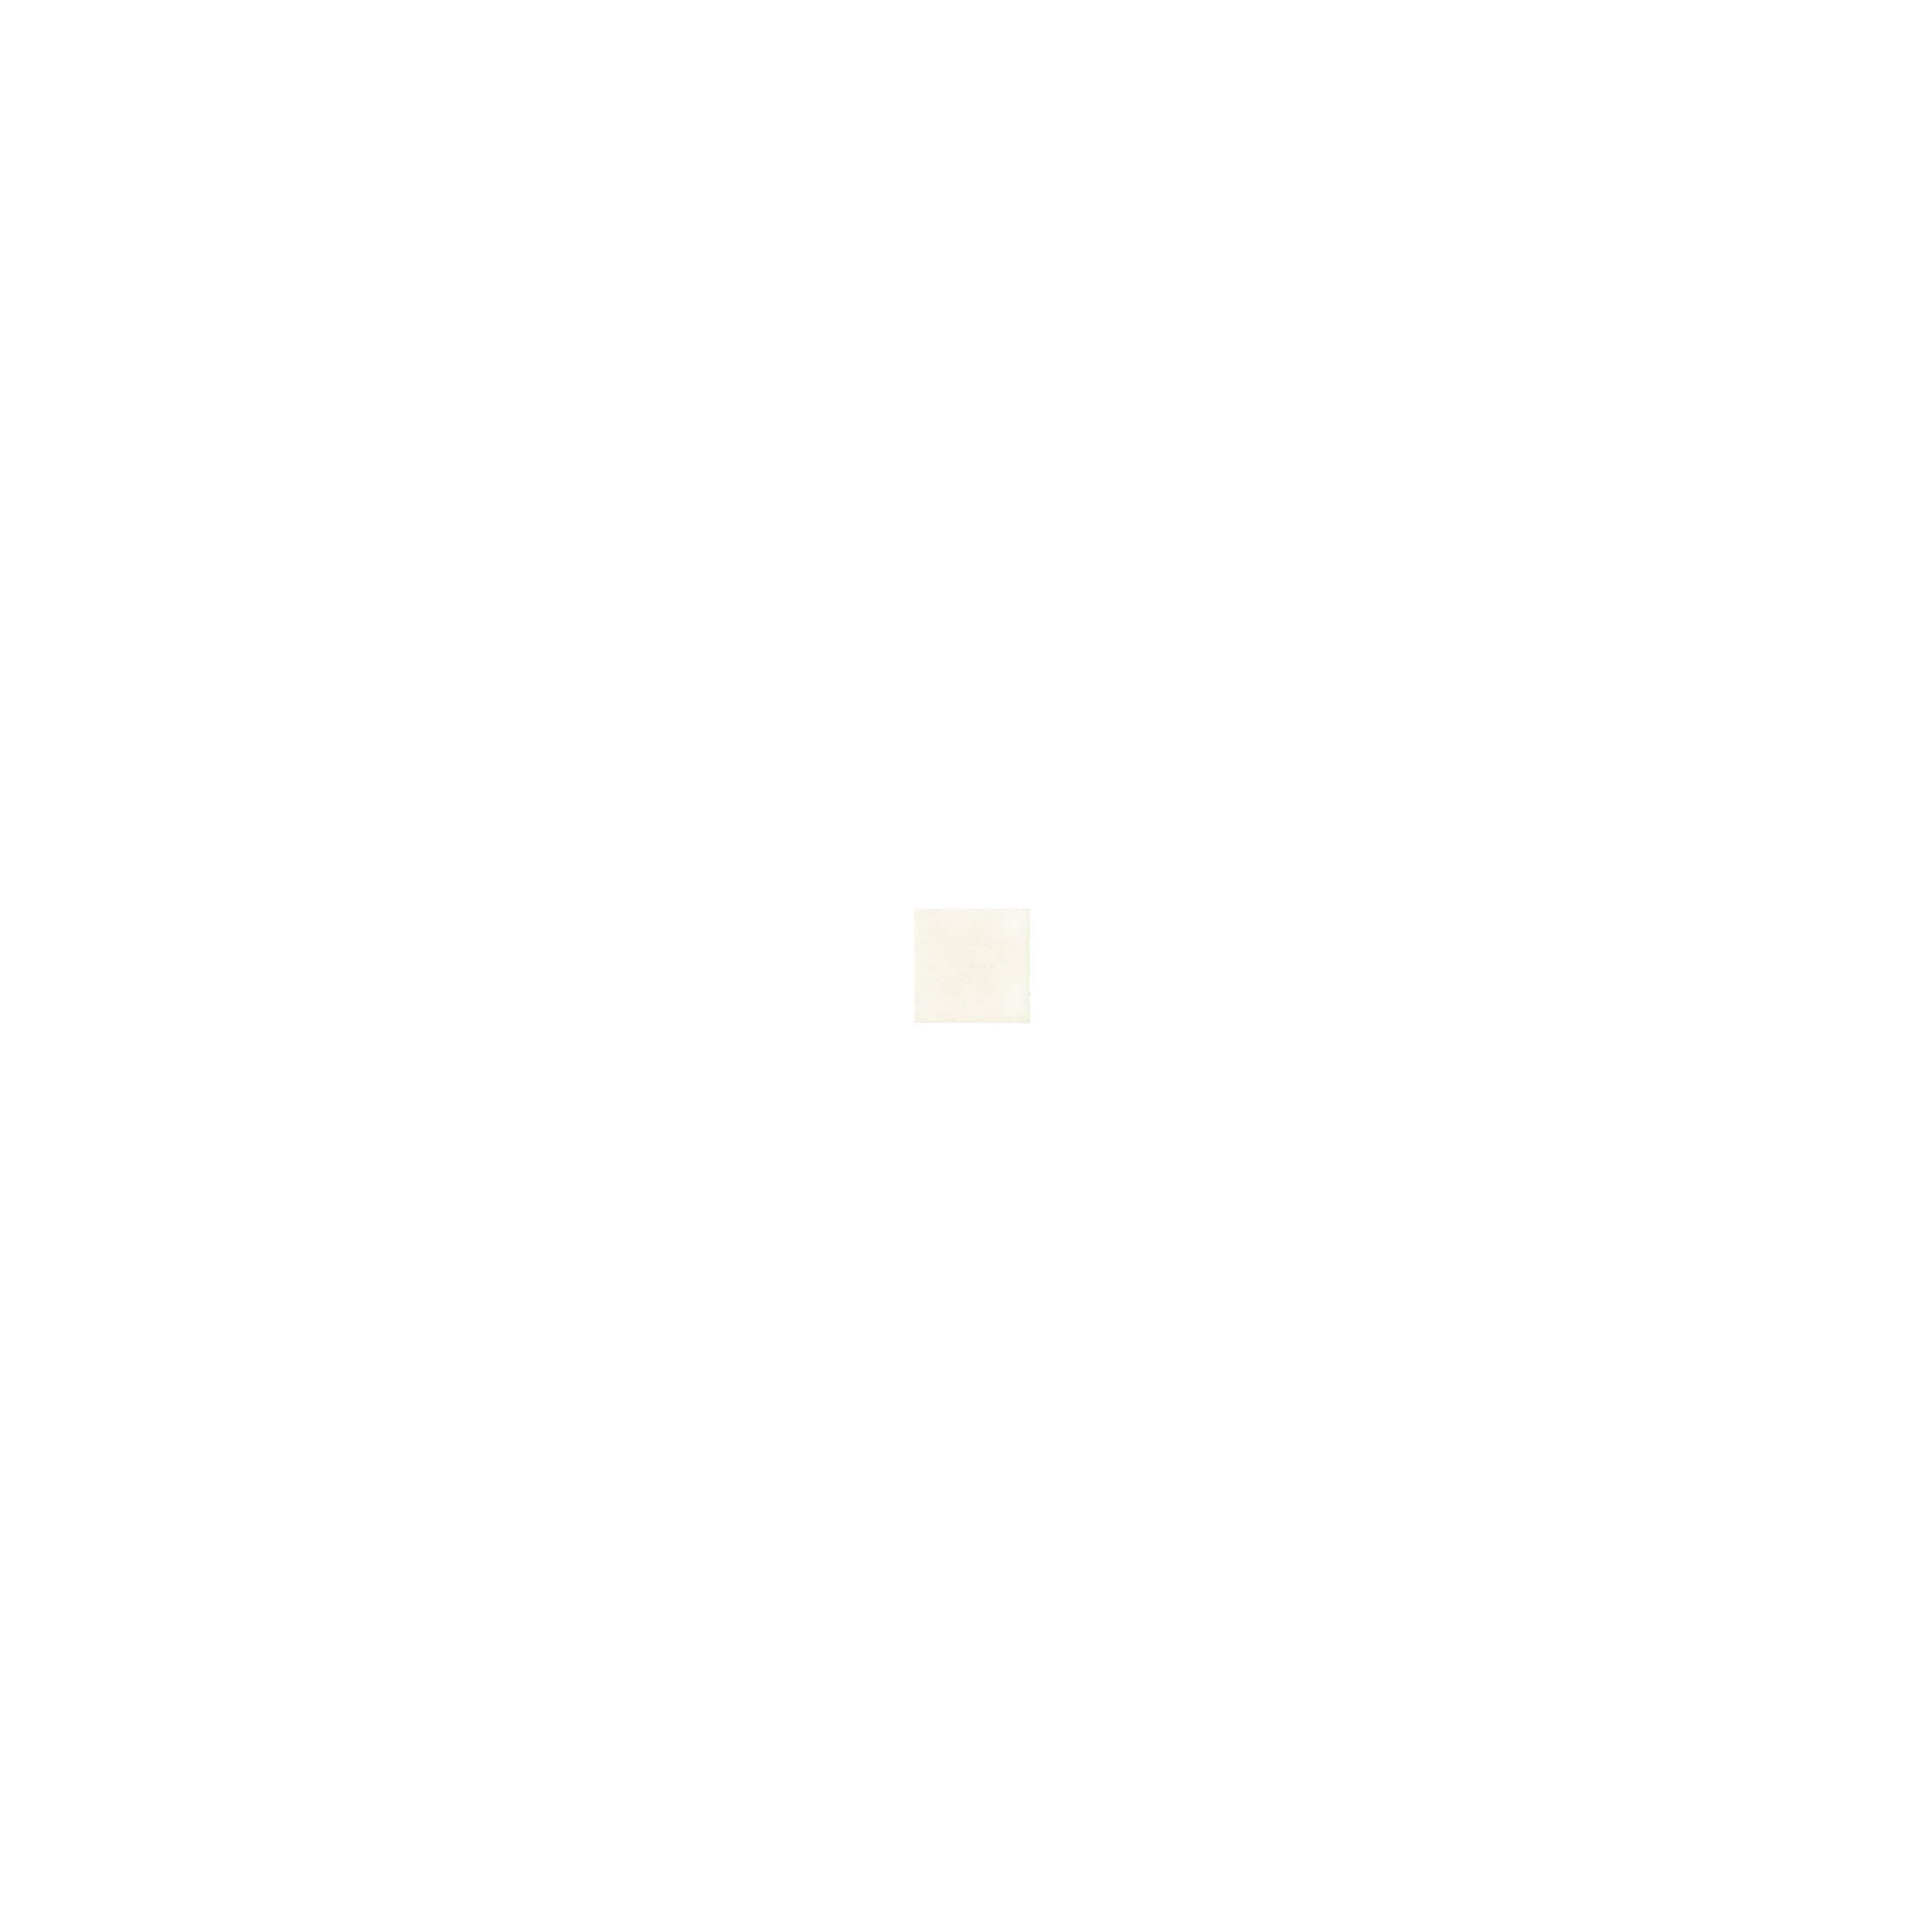 ADEX-ADNE8027-TACO-BISCUIT  -2 cm-2 cm-ROMBOS>LISO